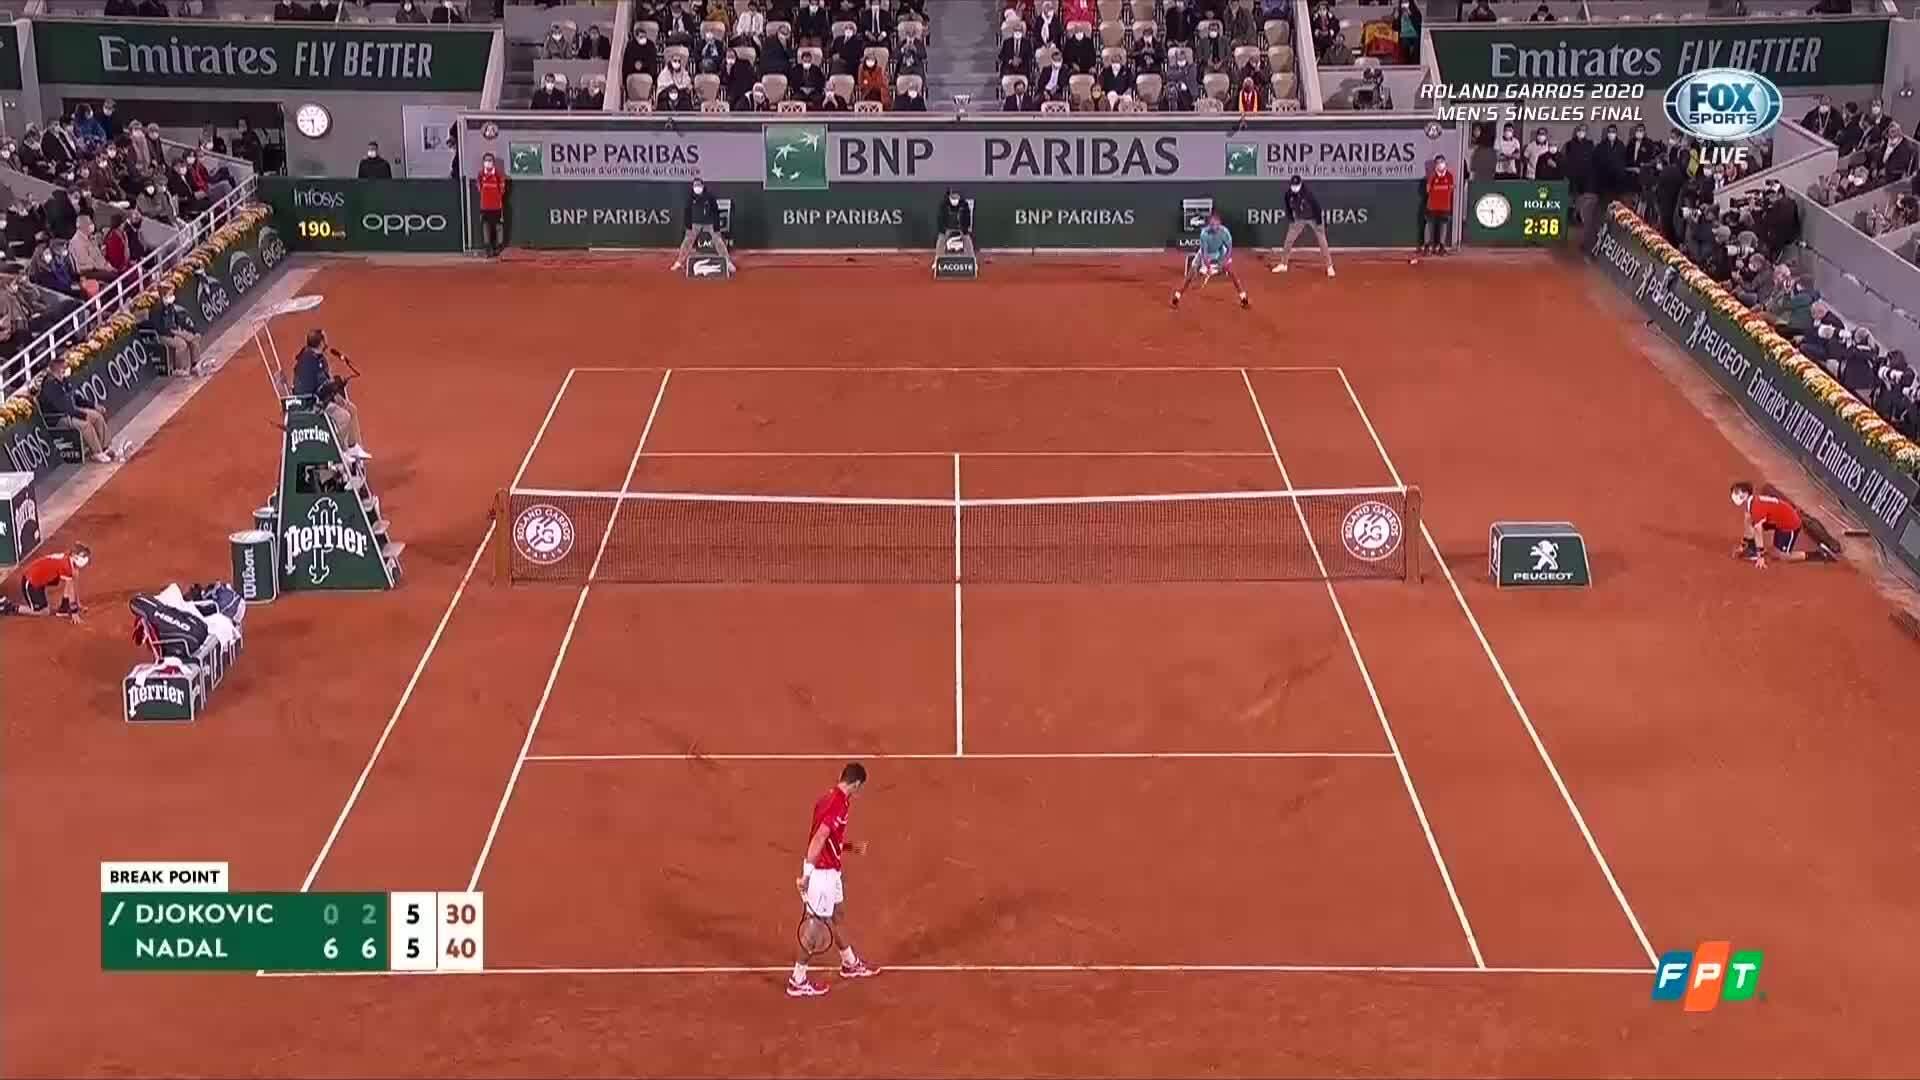 Grand Slam thứ 20 cho Nadal